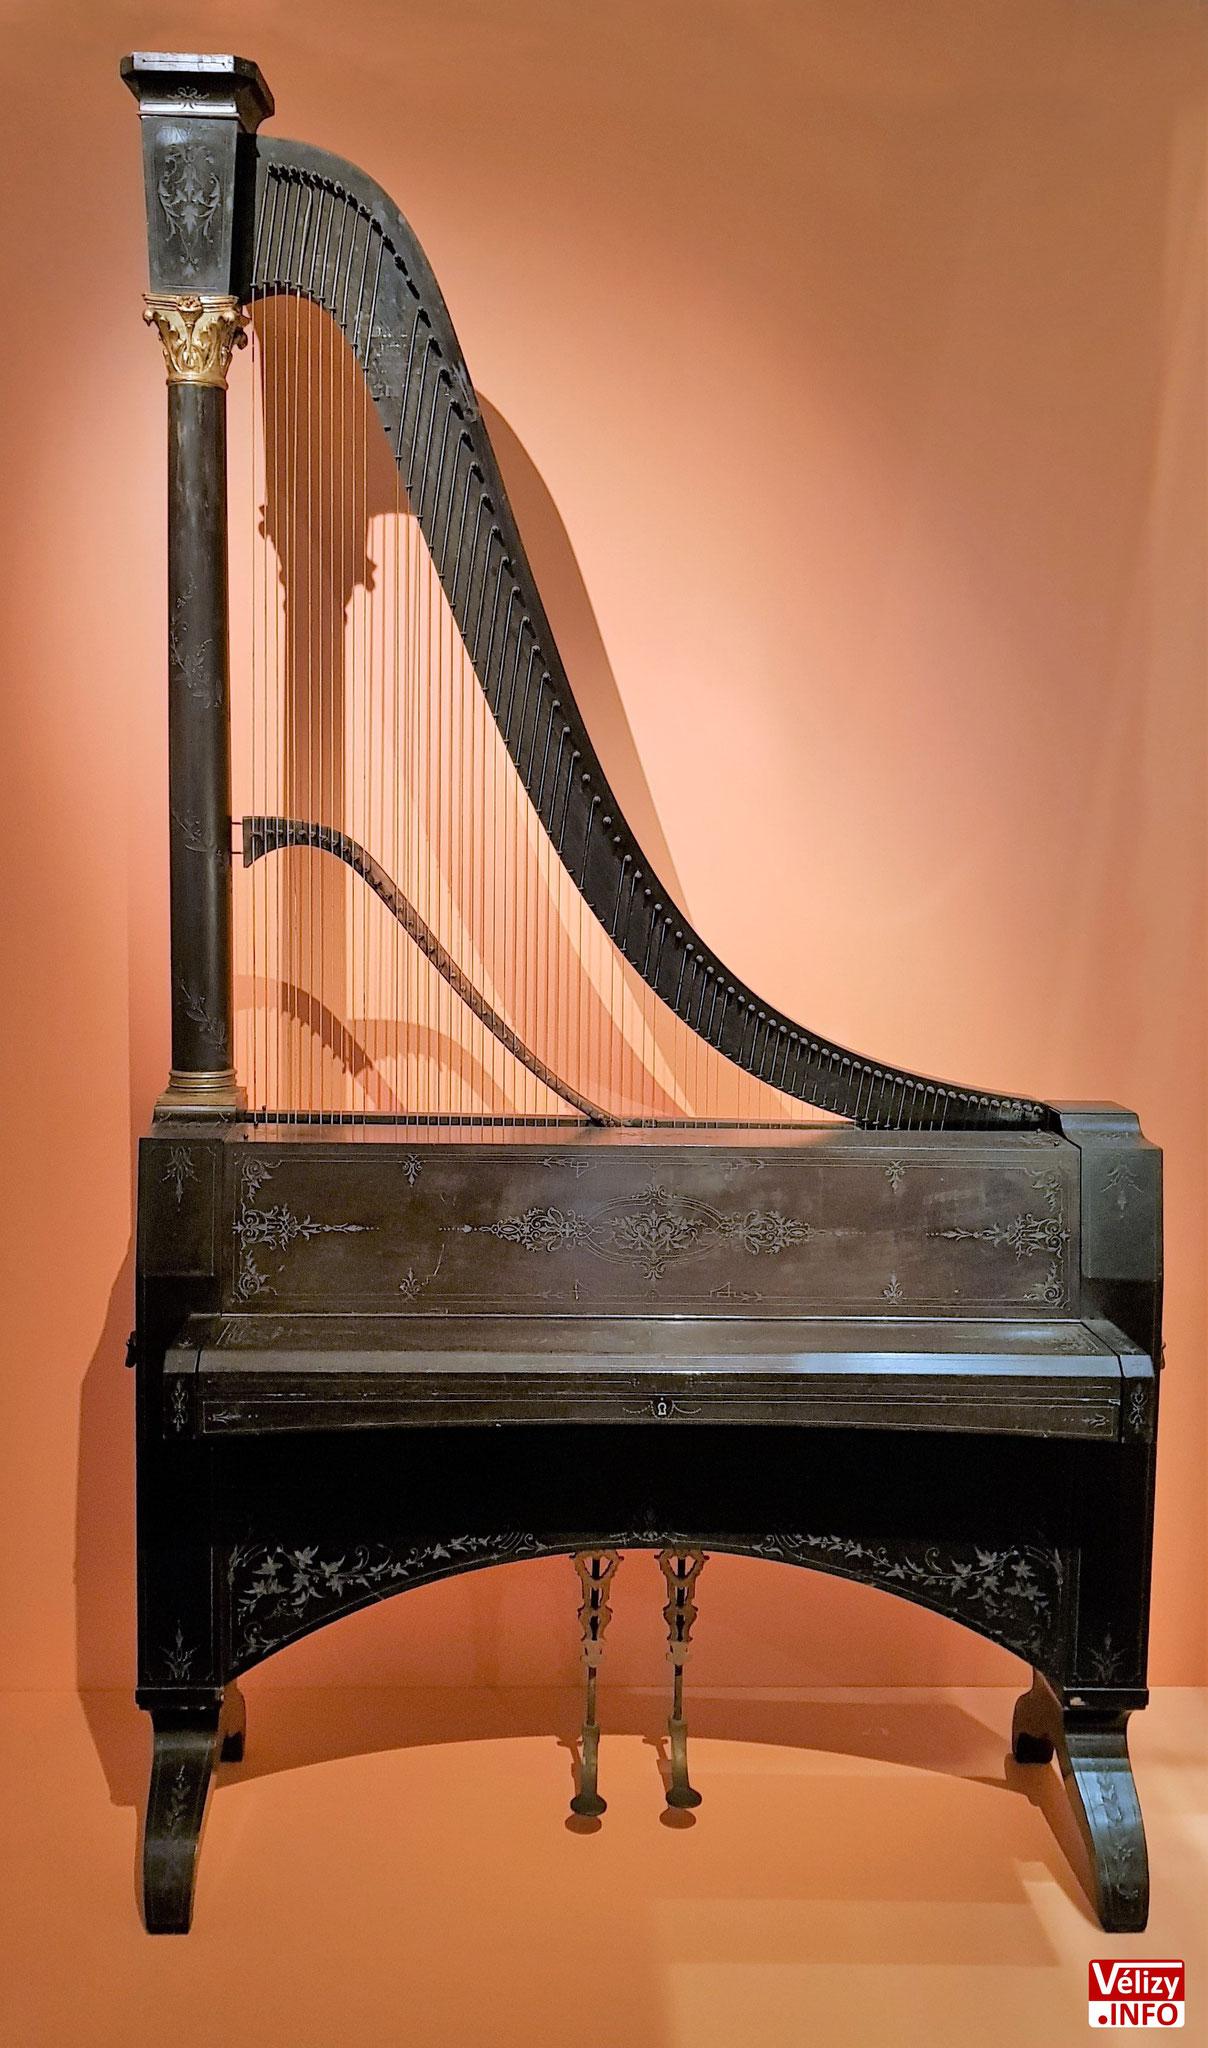 Clavi-harpe, dit piano-girafe.